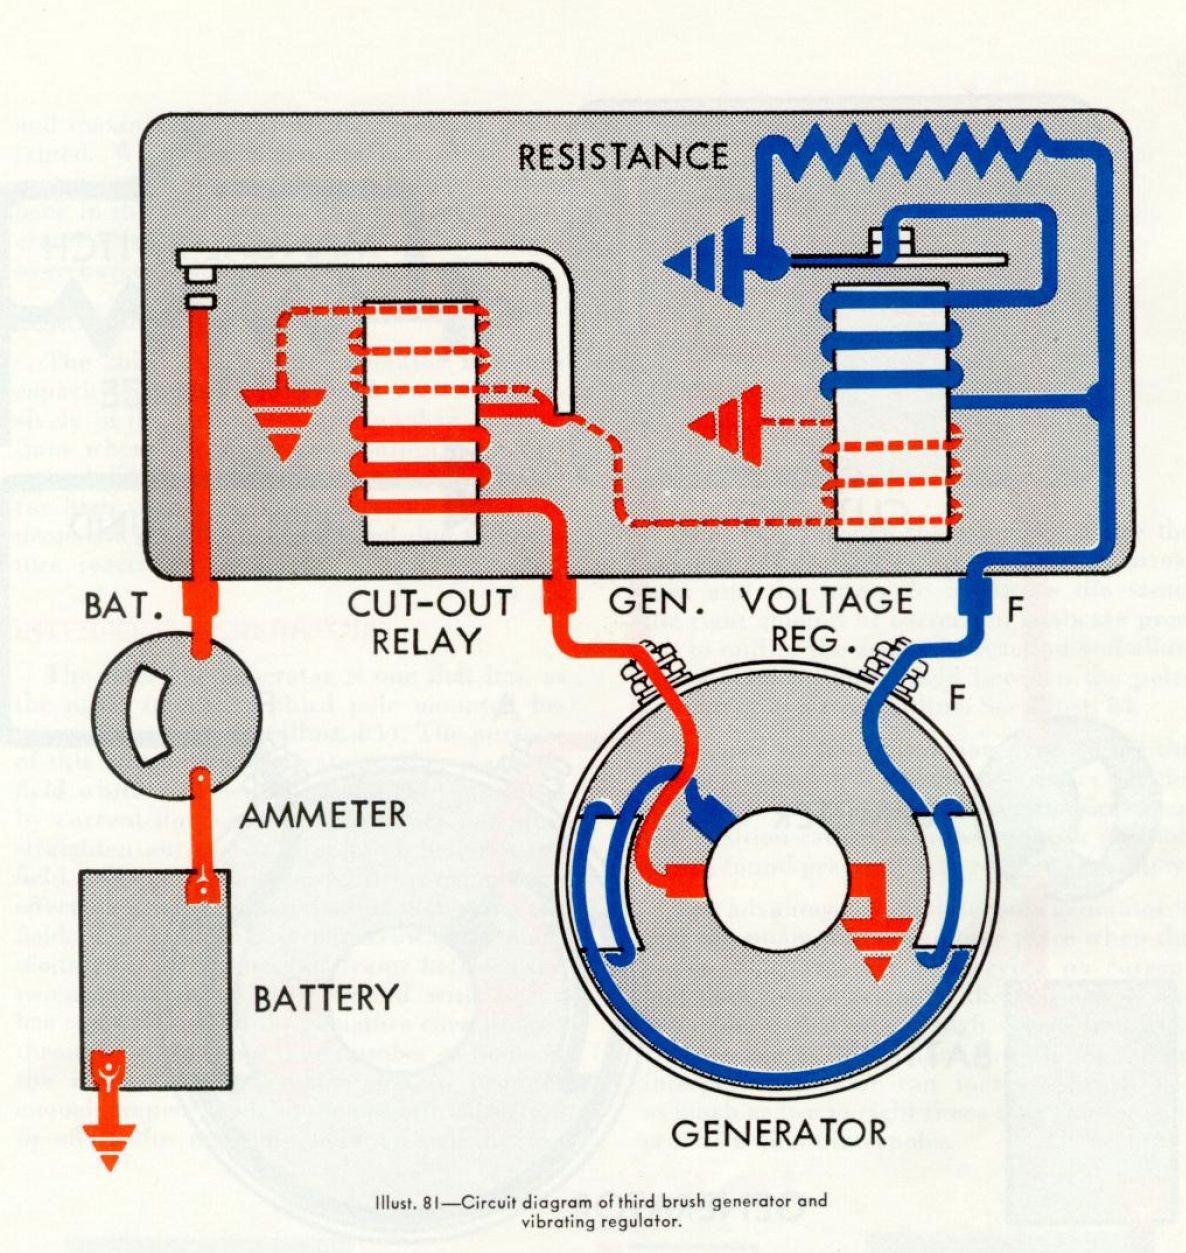 farmall h voltage regulator problems - technical ih talk - red power  magazine community  red power magazine